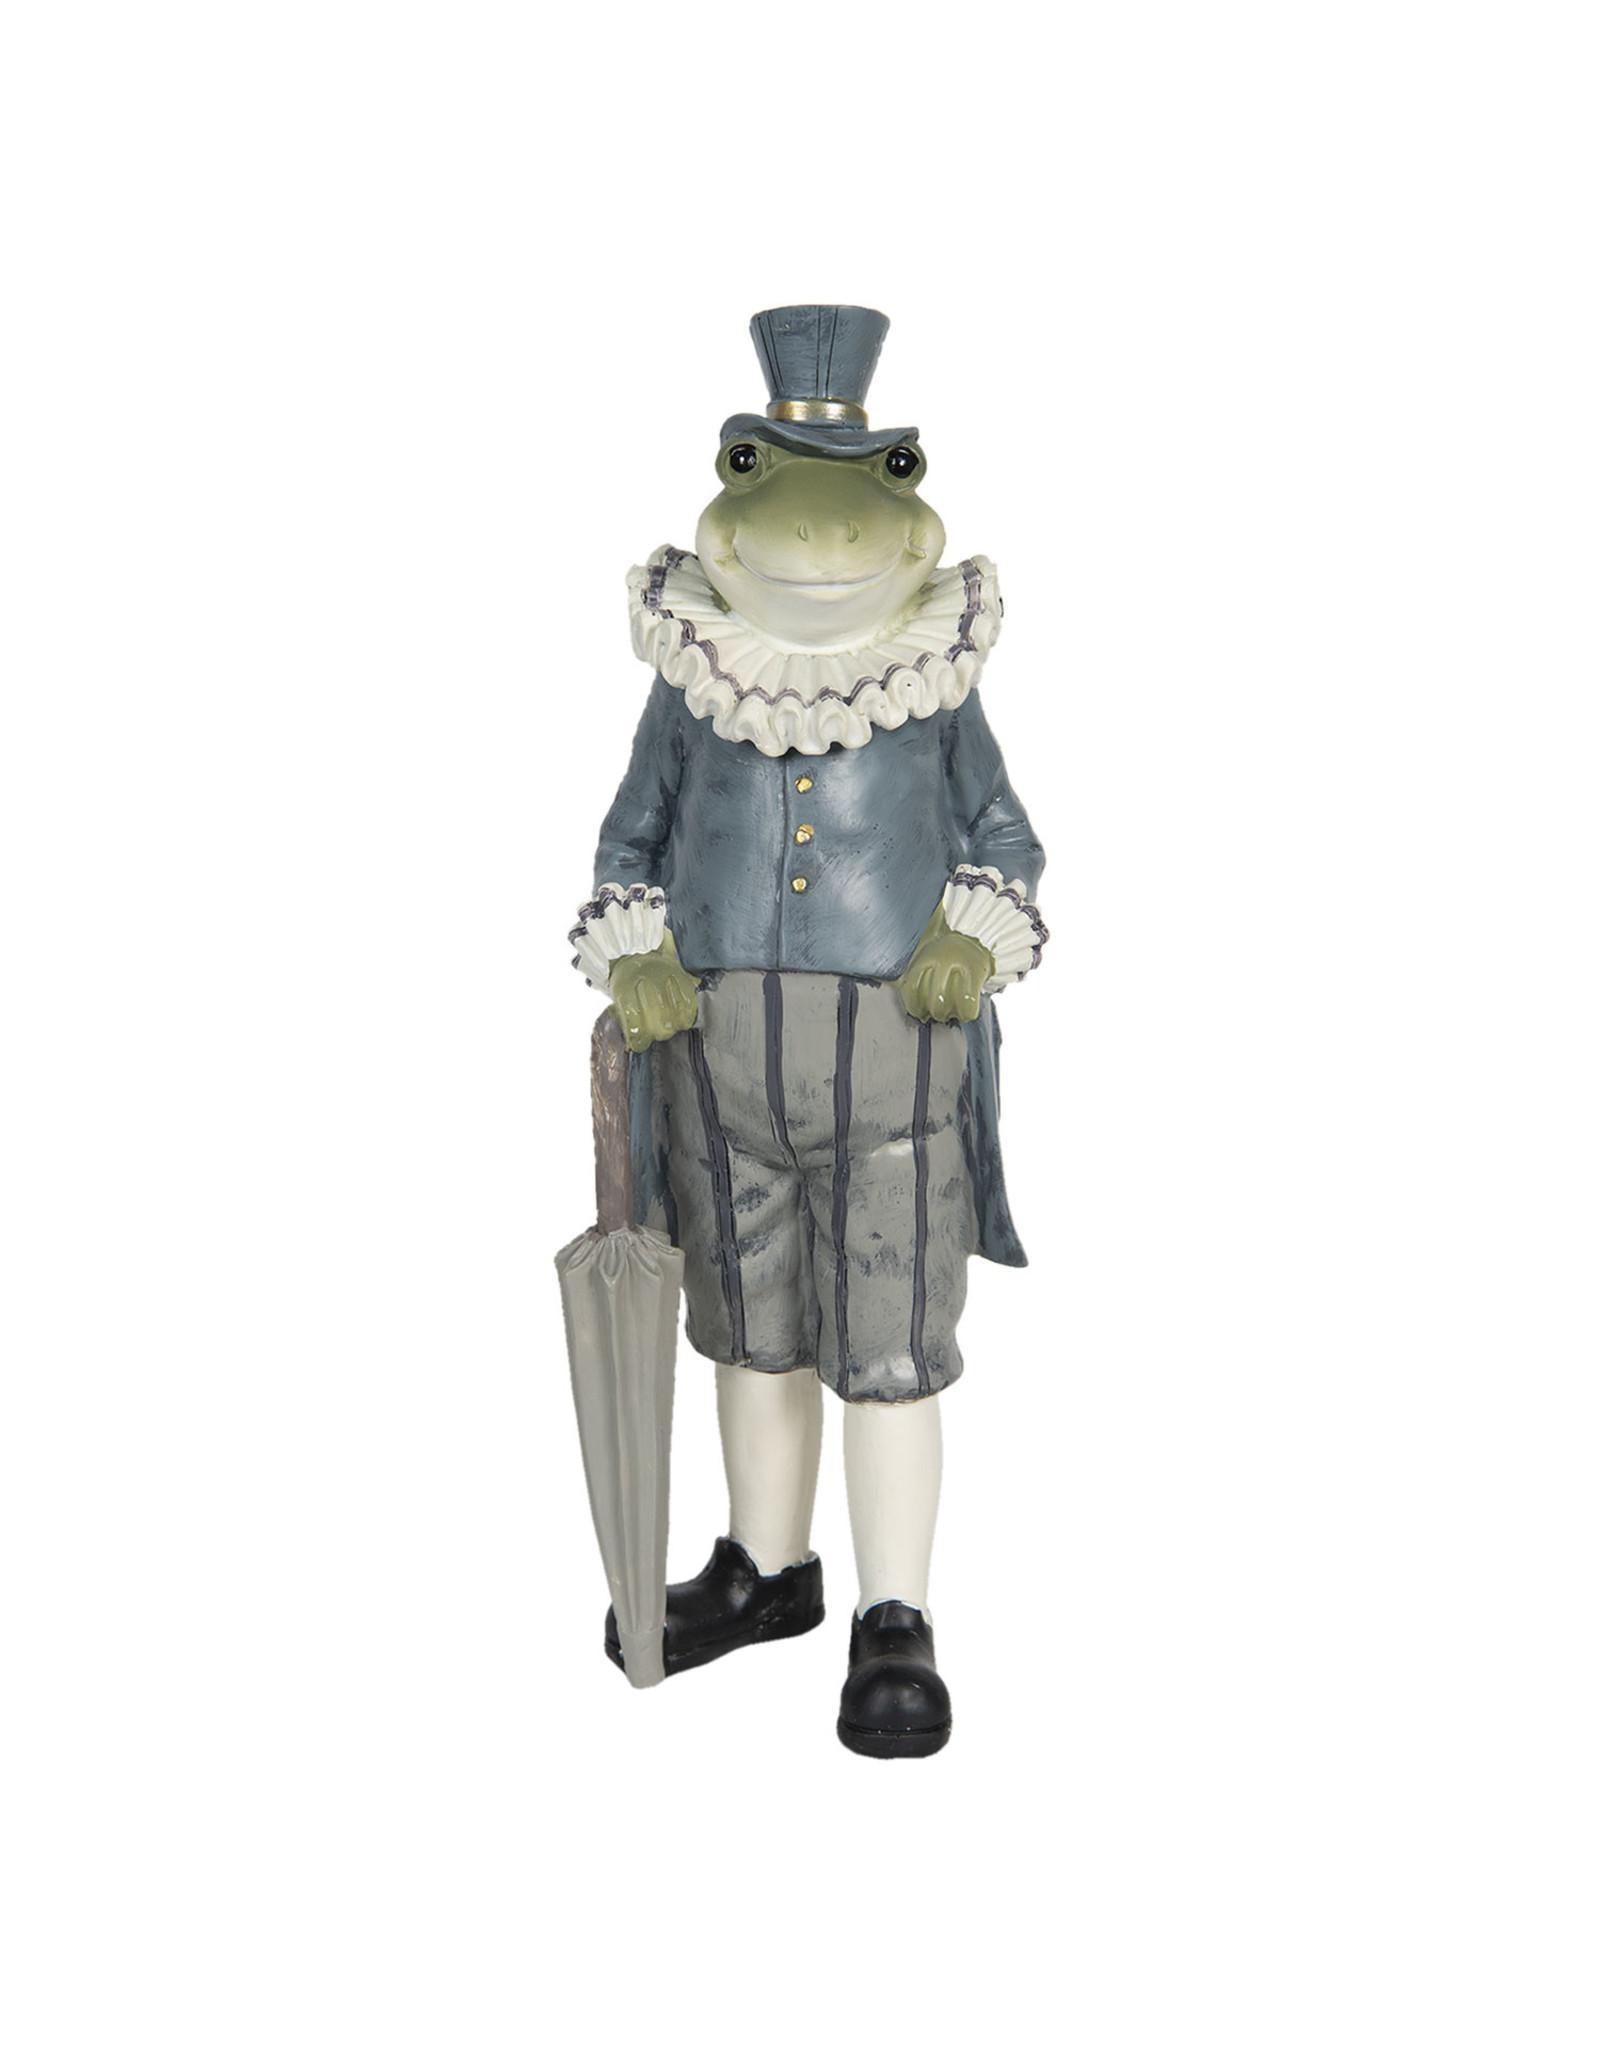 Trukado Giftware Figurines Collectables - Frog with umbrella figurine 27cm